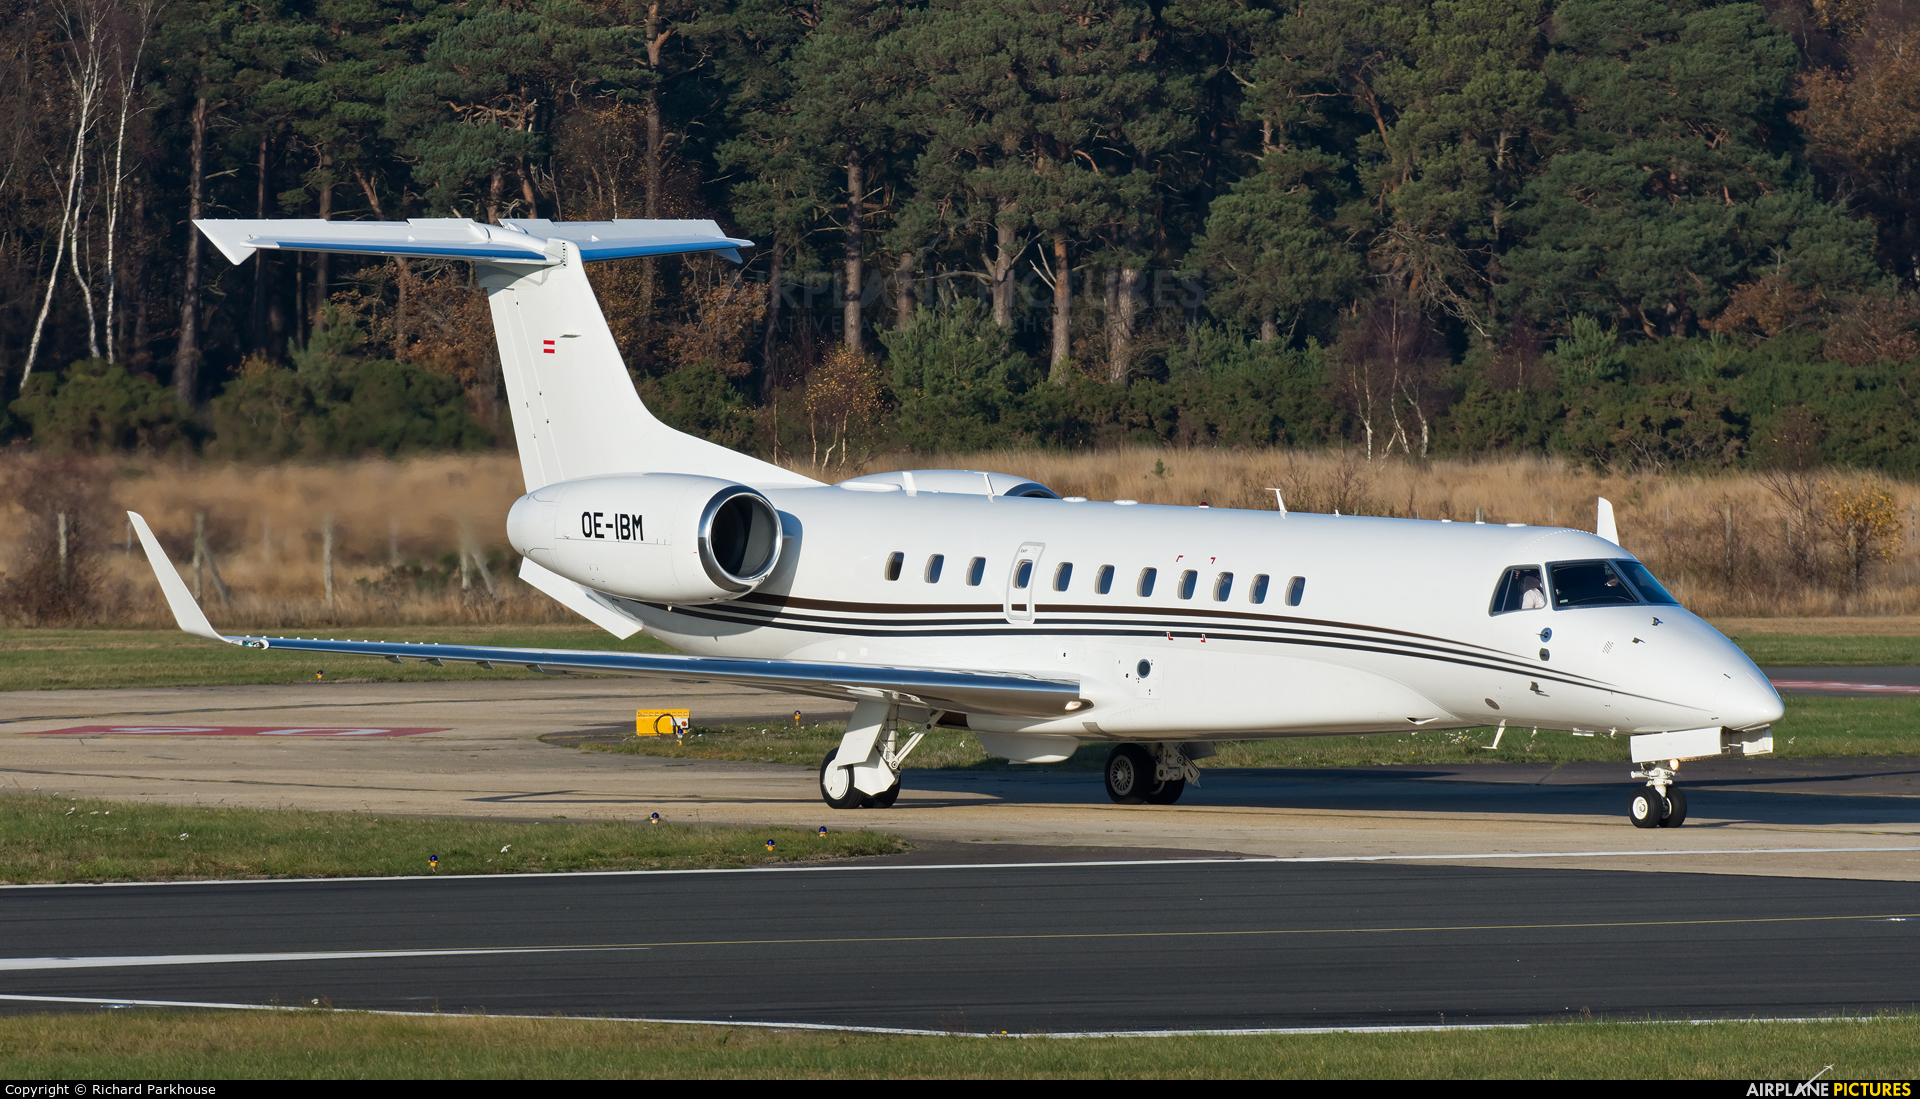 MJet Aviation OE-IBM aircraft at Farnborough